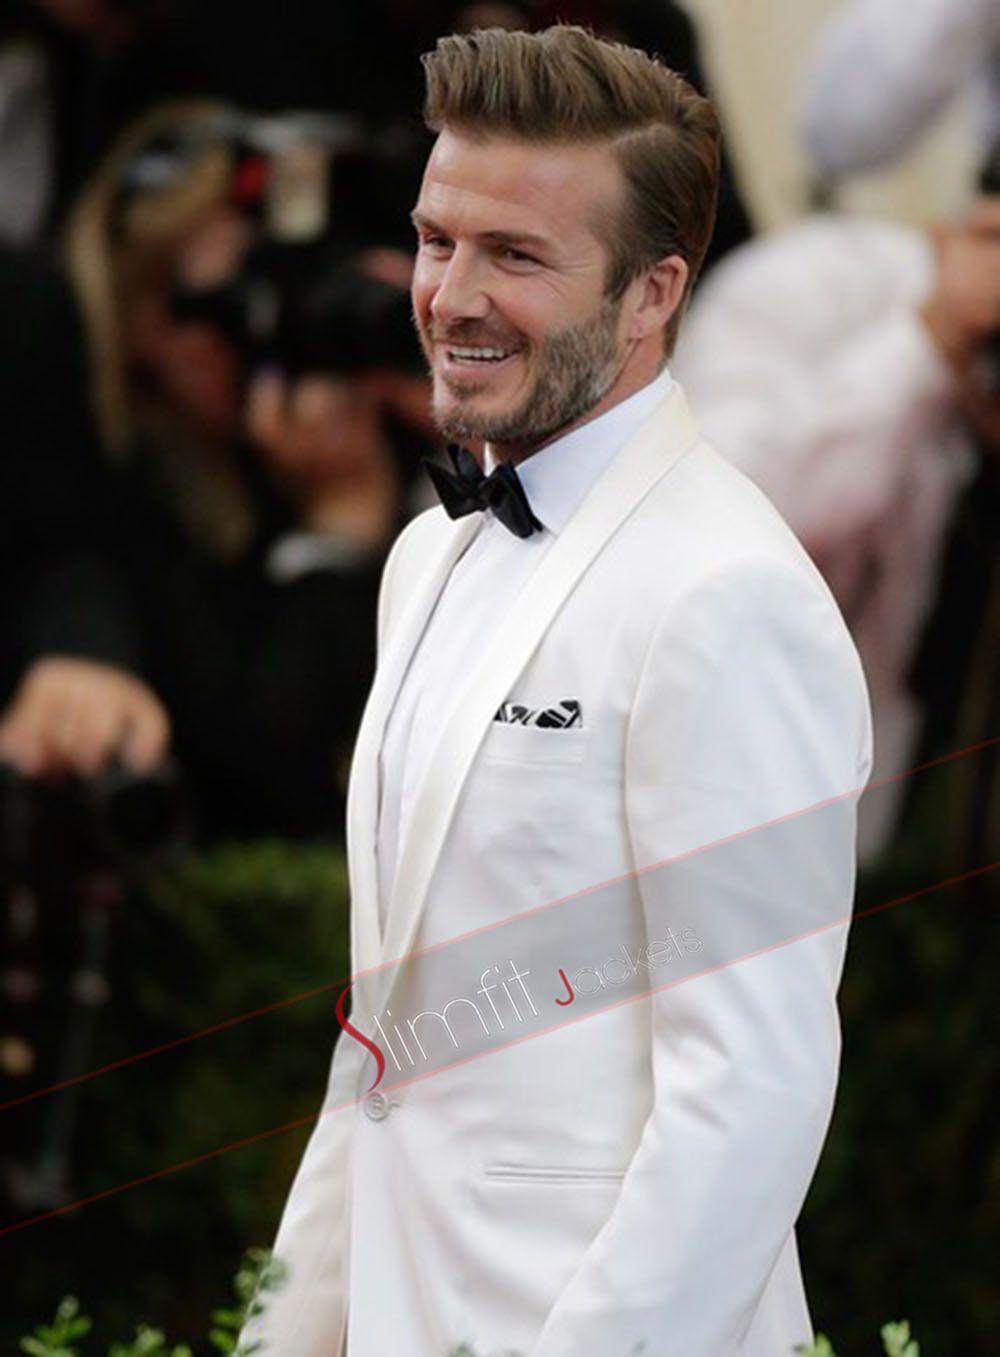 Ivory White David Beckham Suit | Celebrity | Pinterest | David ...